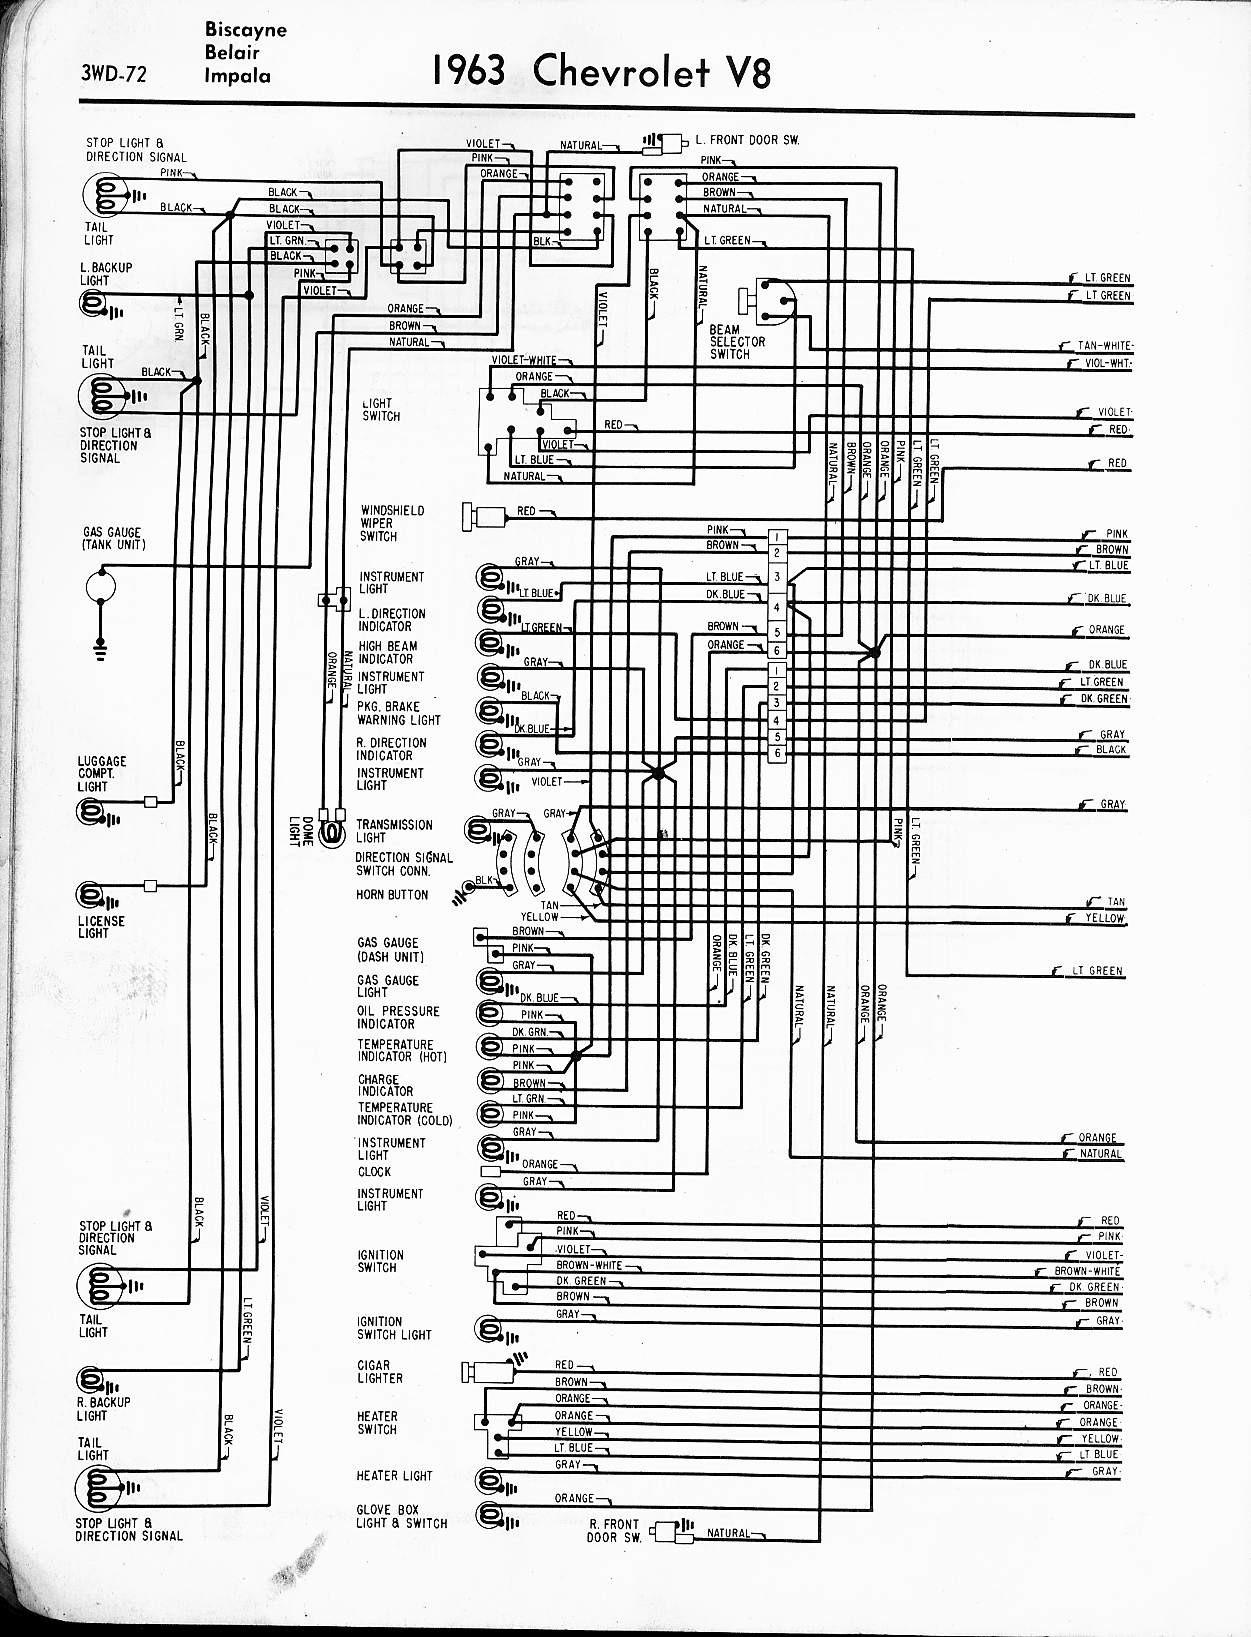 LA_7621] Chevy Nova Wiring Diagram On 63 Chevy C10 Fuel Gauge Wiring  Diagrams Wiring DiagramIvoro Vira Mohammedshrine Librar Wiring 101